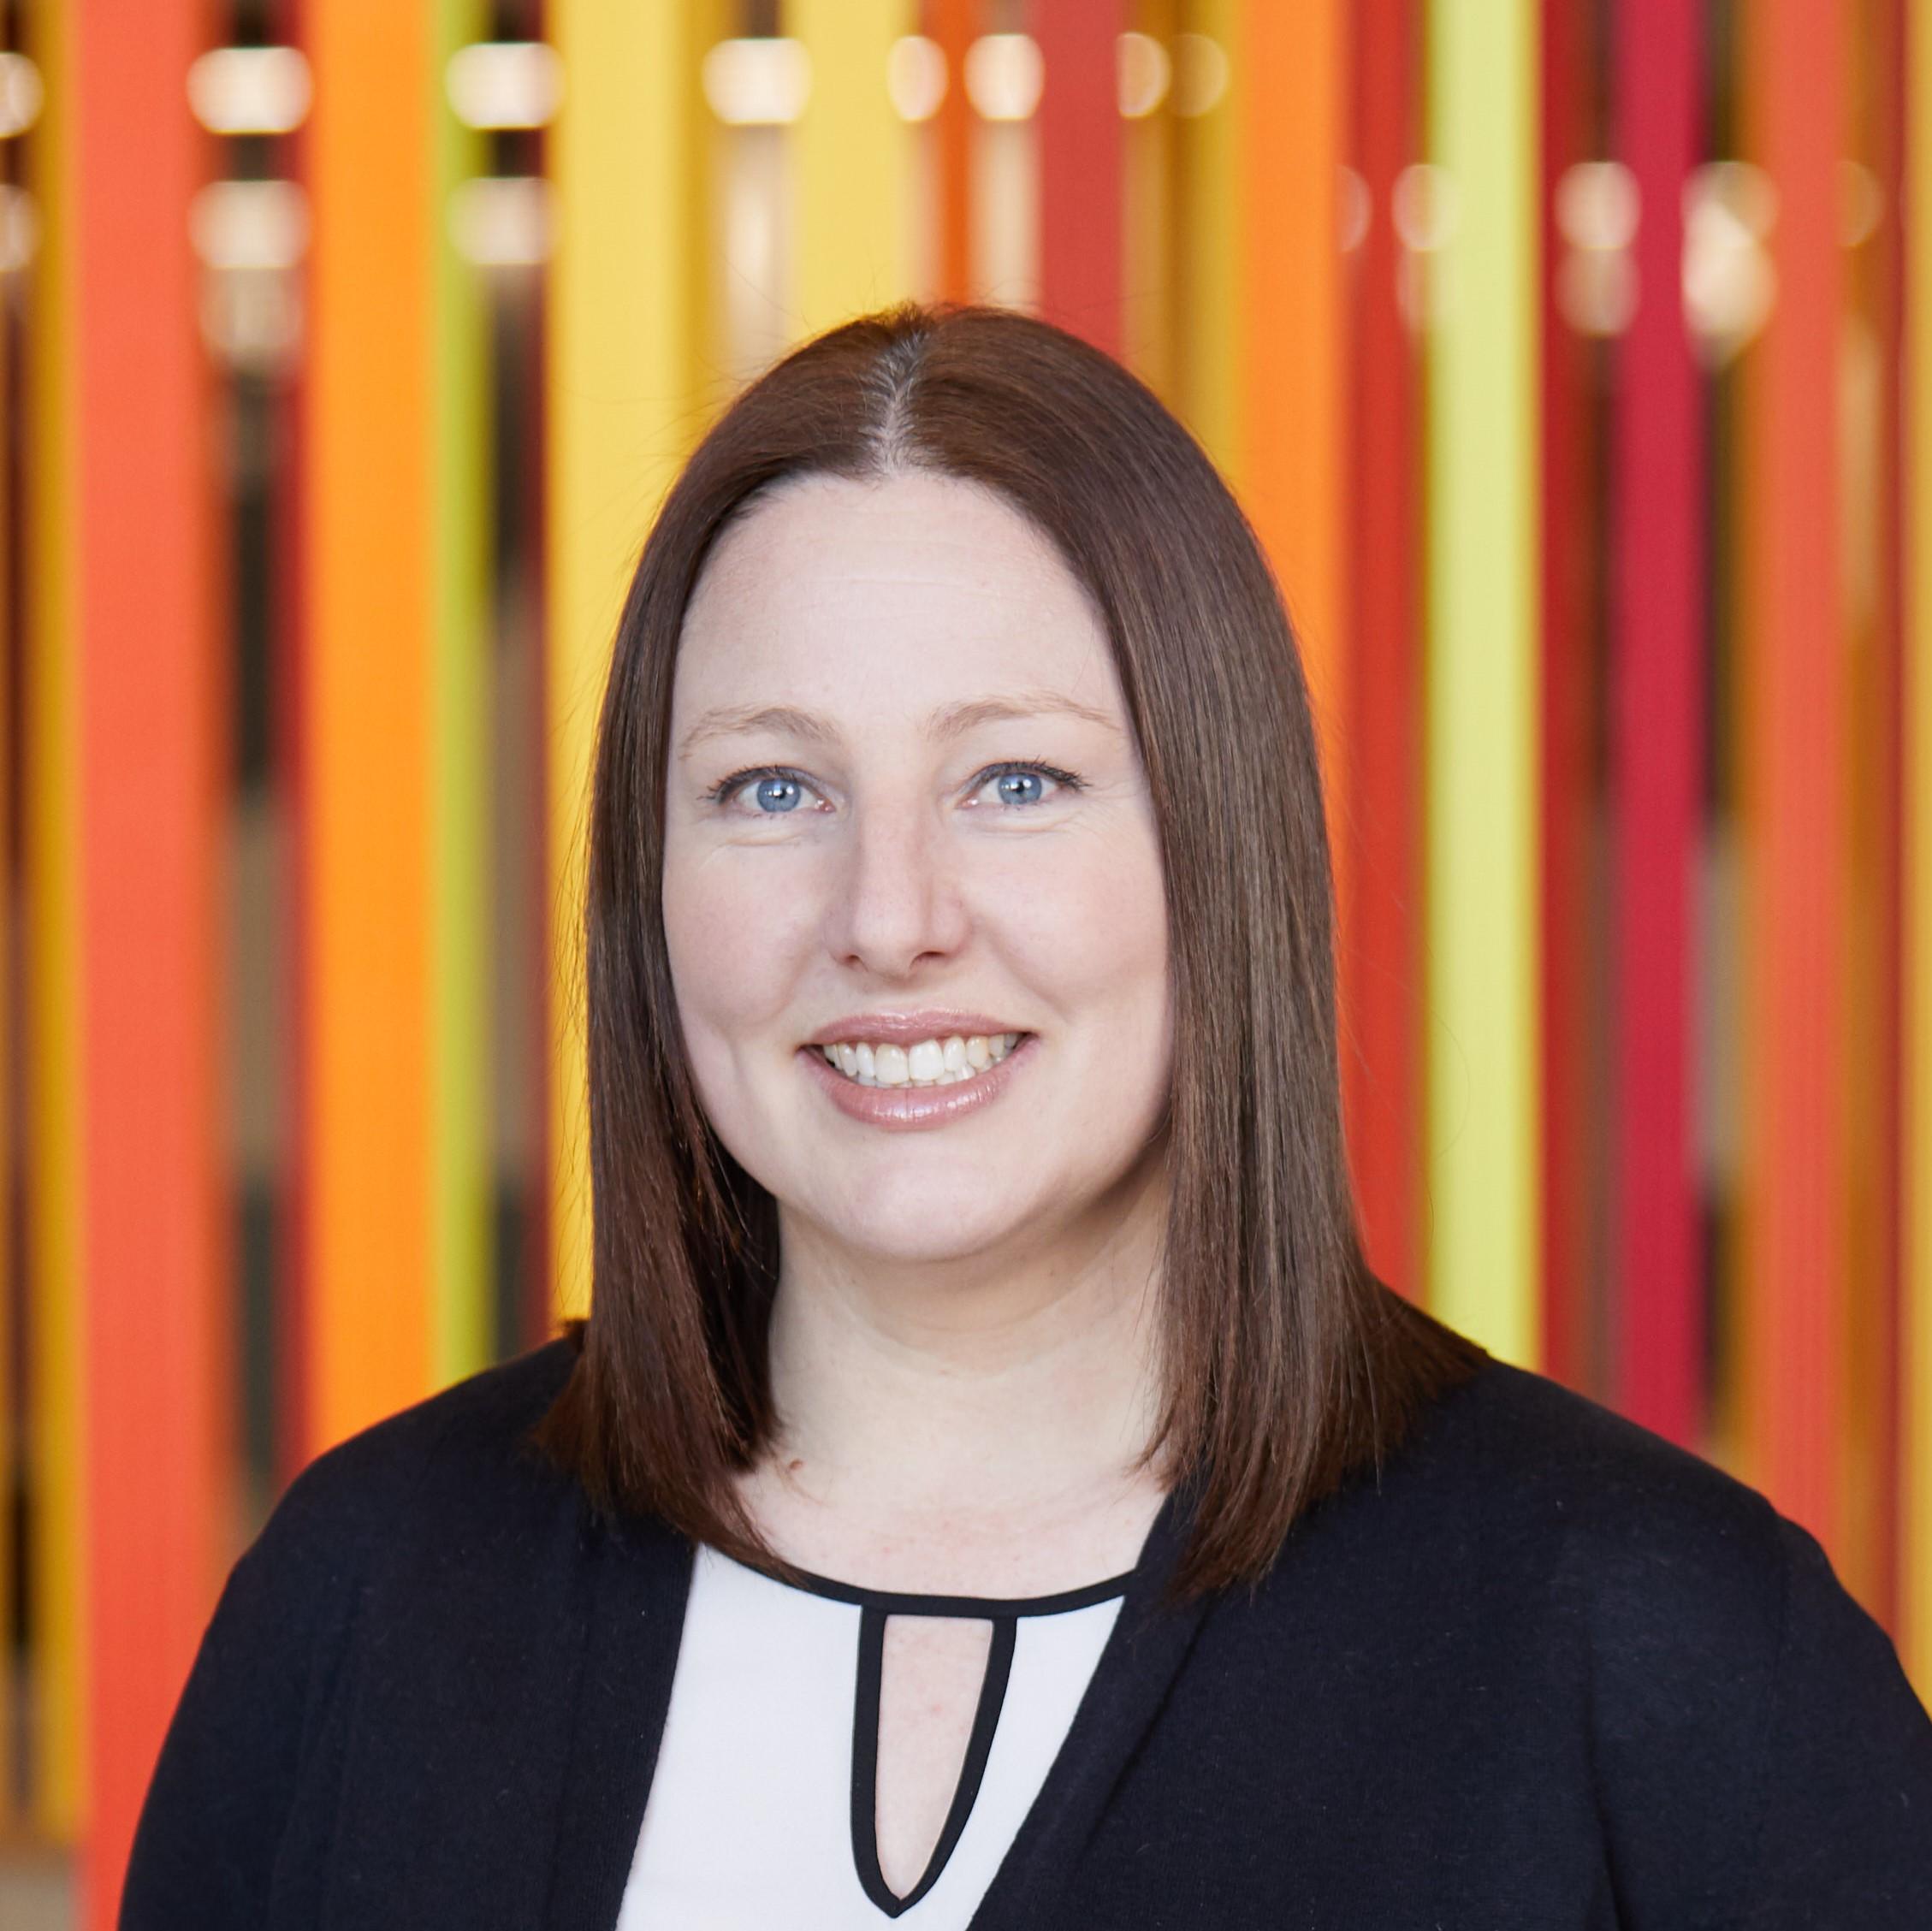 Dr Megan Denise Lenardon